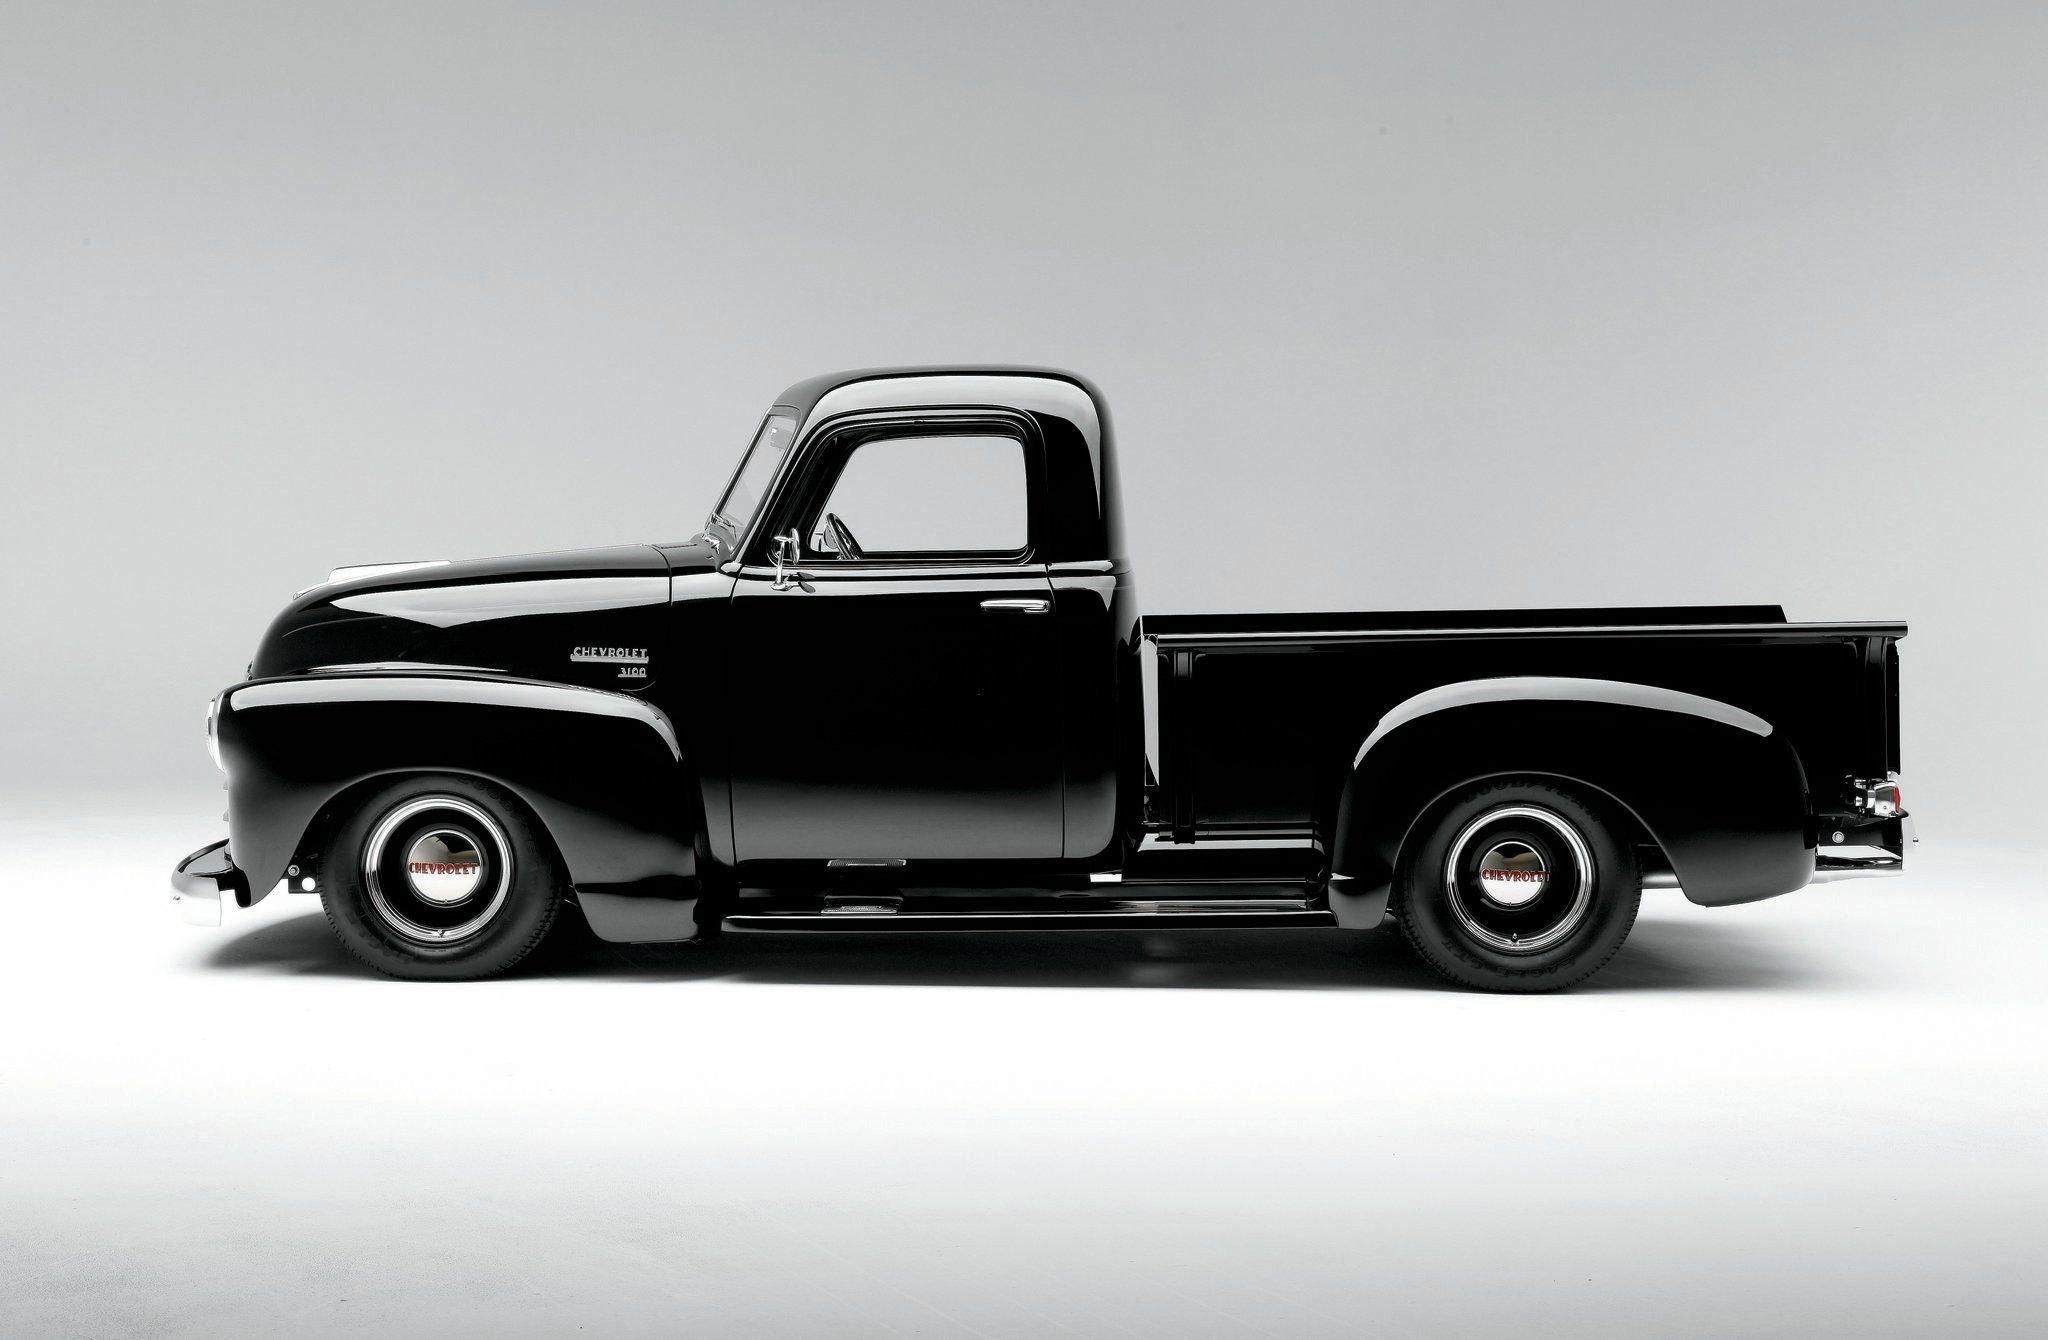 1949 dodge truck wallpaper - photo #19